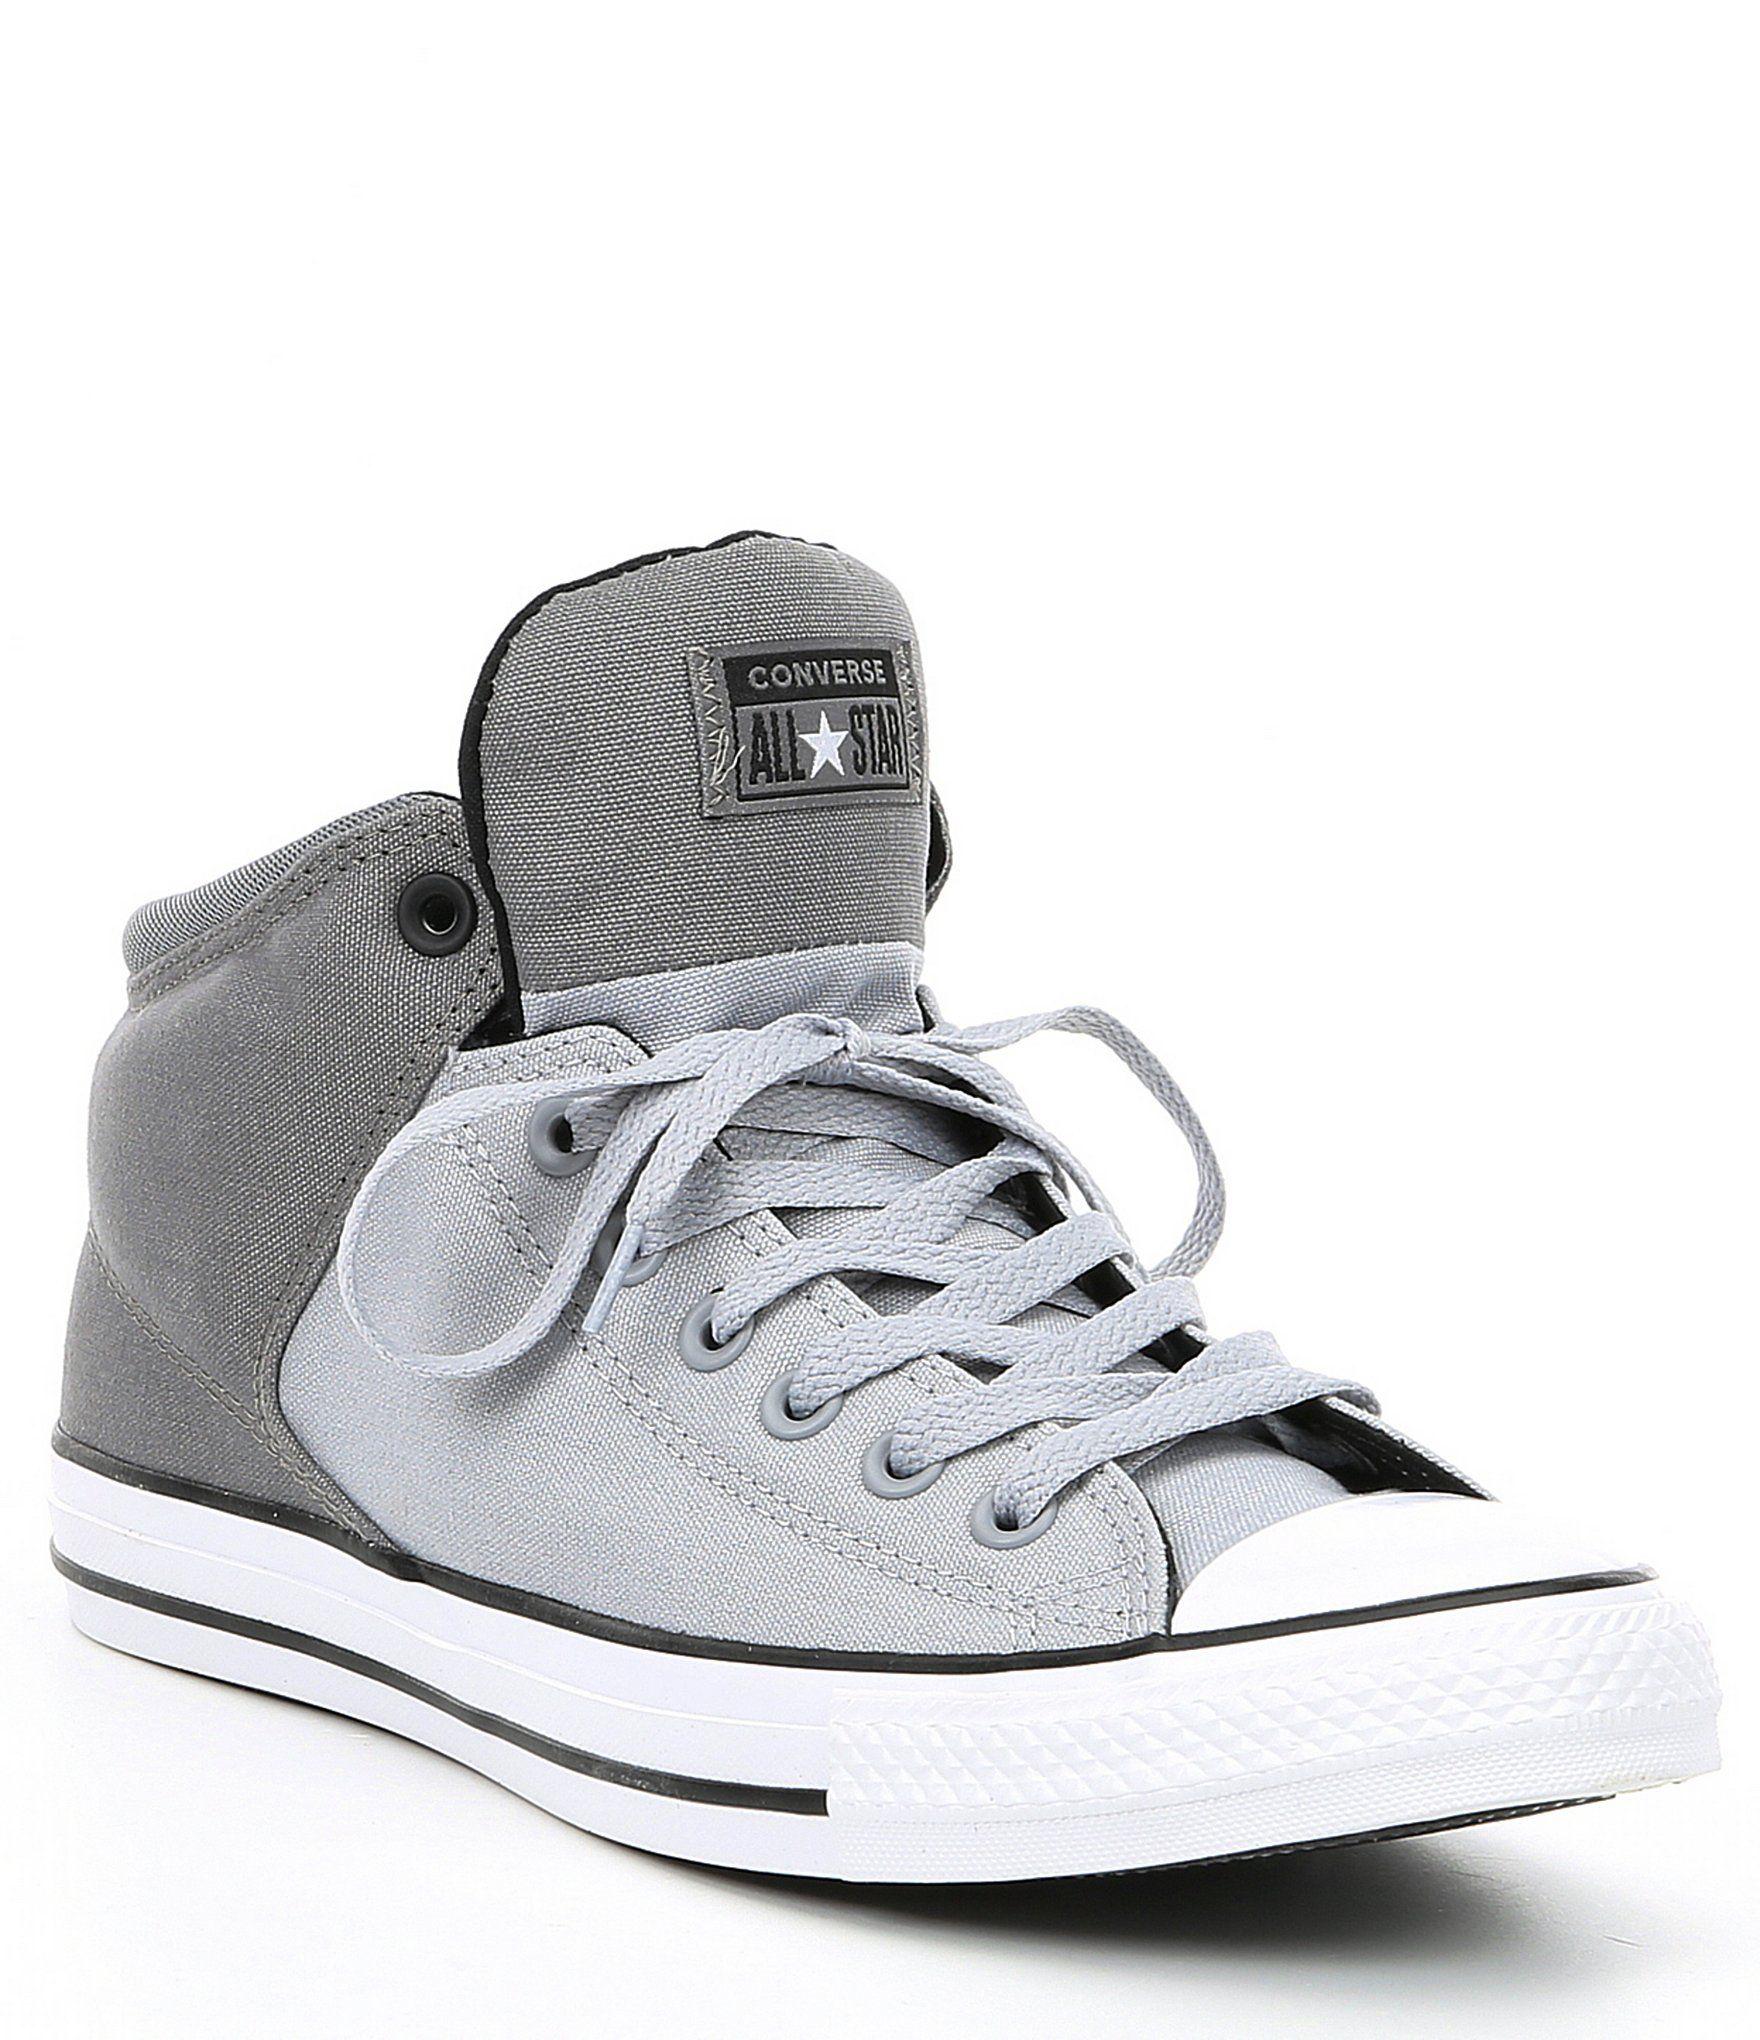 Converse Chuck Taylor All Star Hi Sneakers Grey